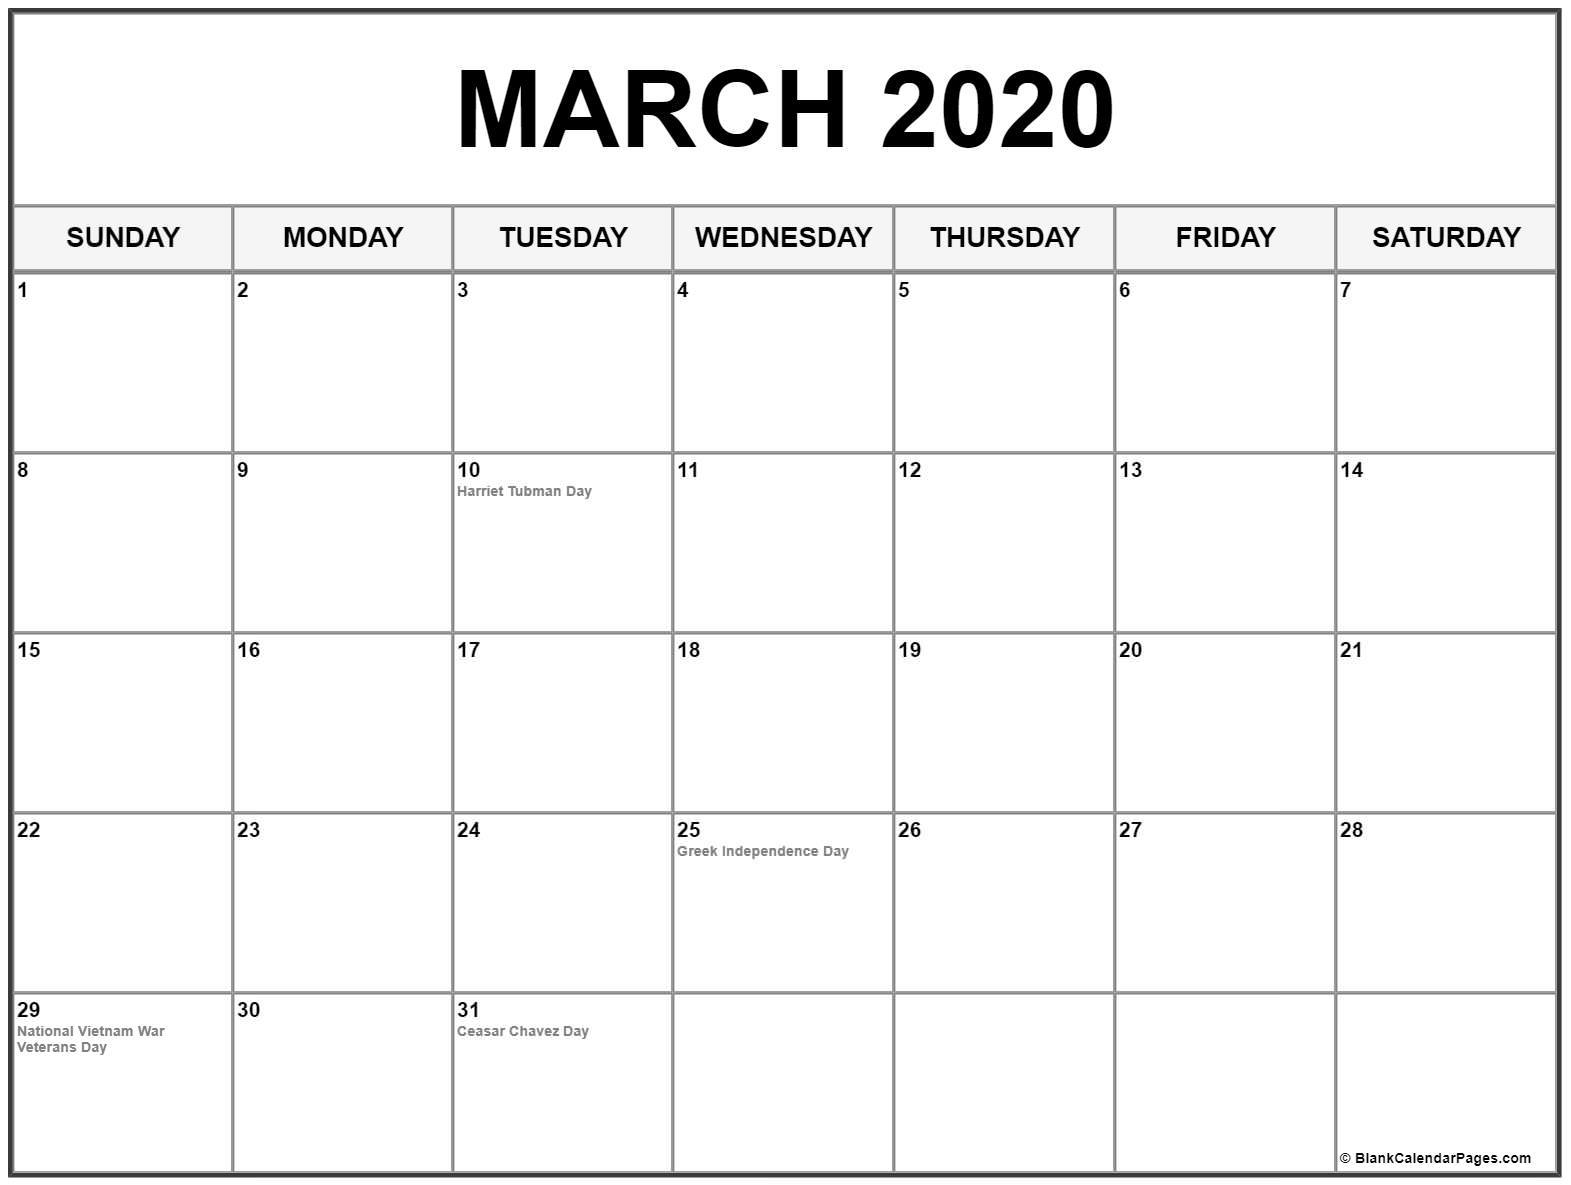 March 2020 calendar US Holidays